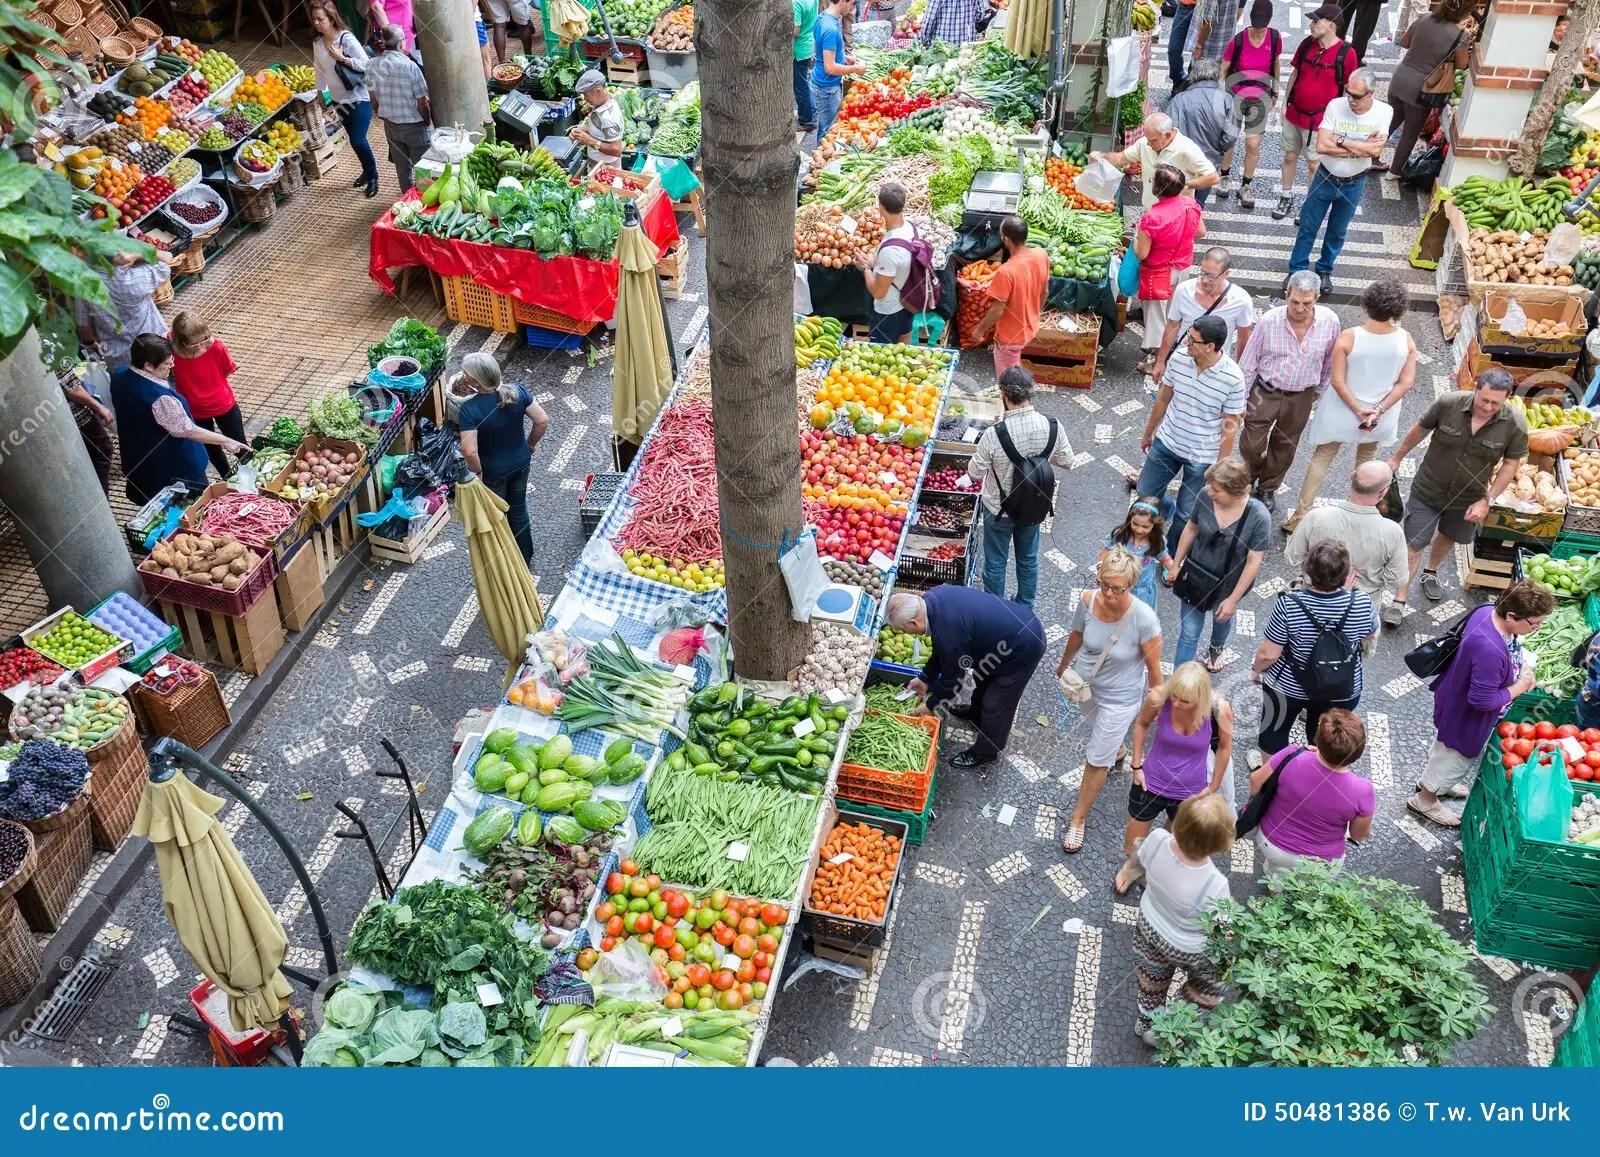 Green Market Farmers City